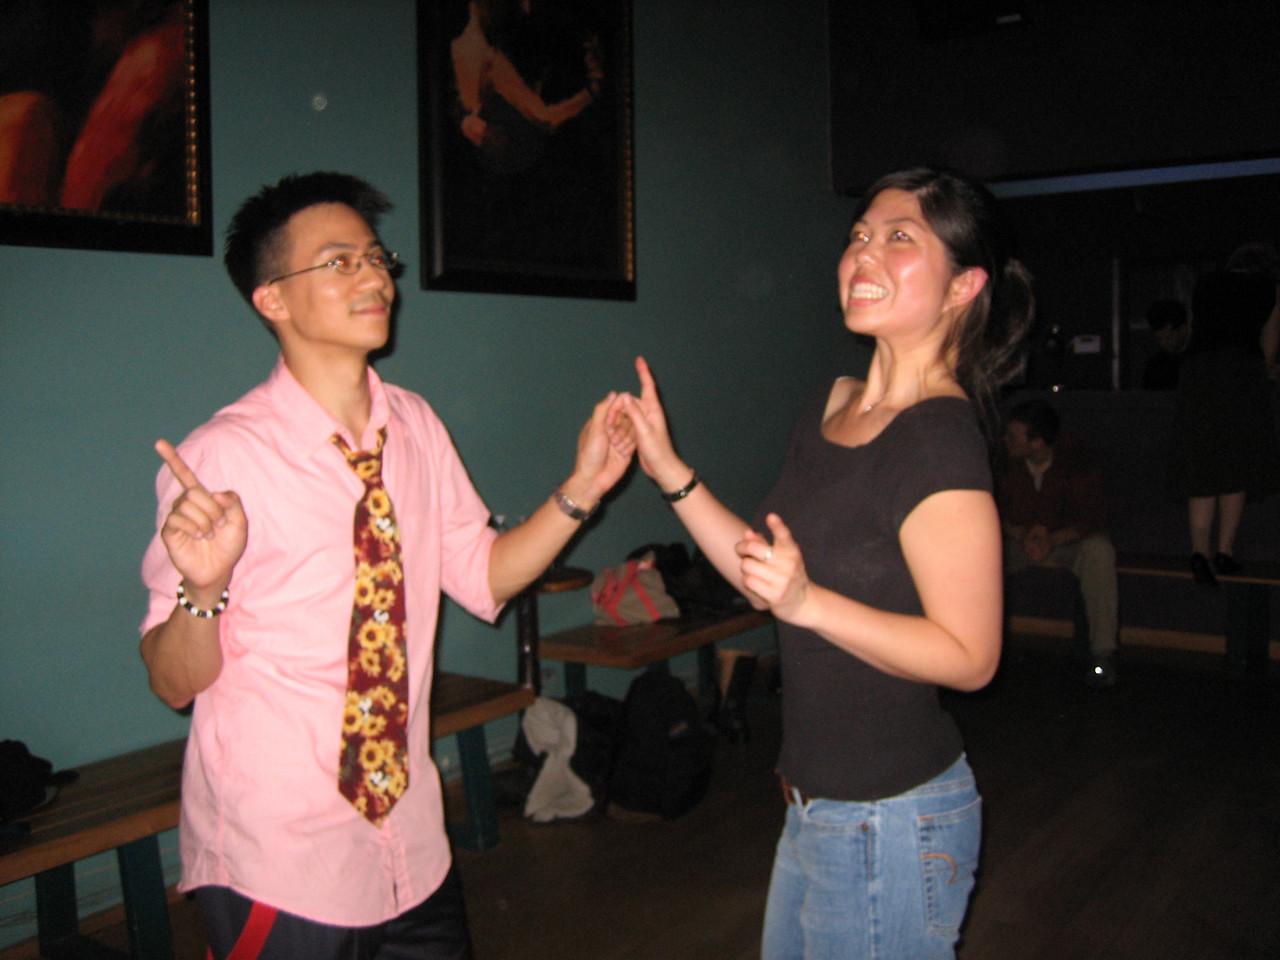 2006 05 12 Fri - Ben Yu & Evelyn Yao boogie